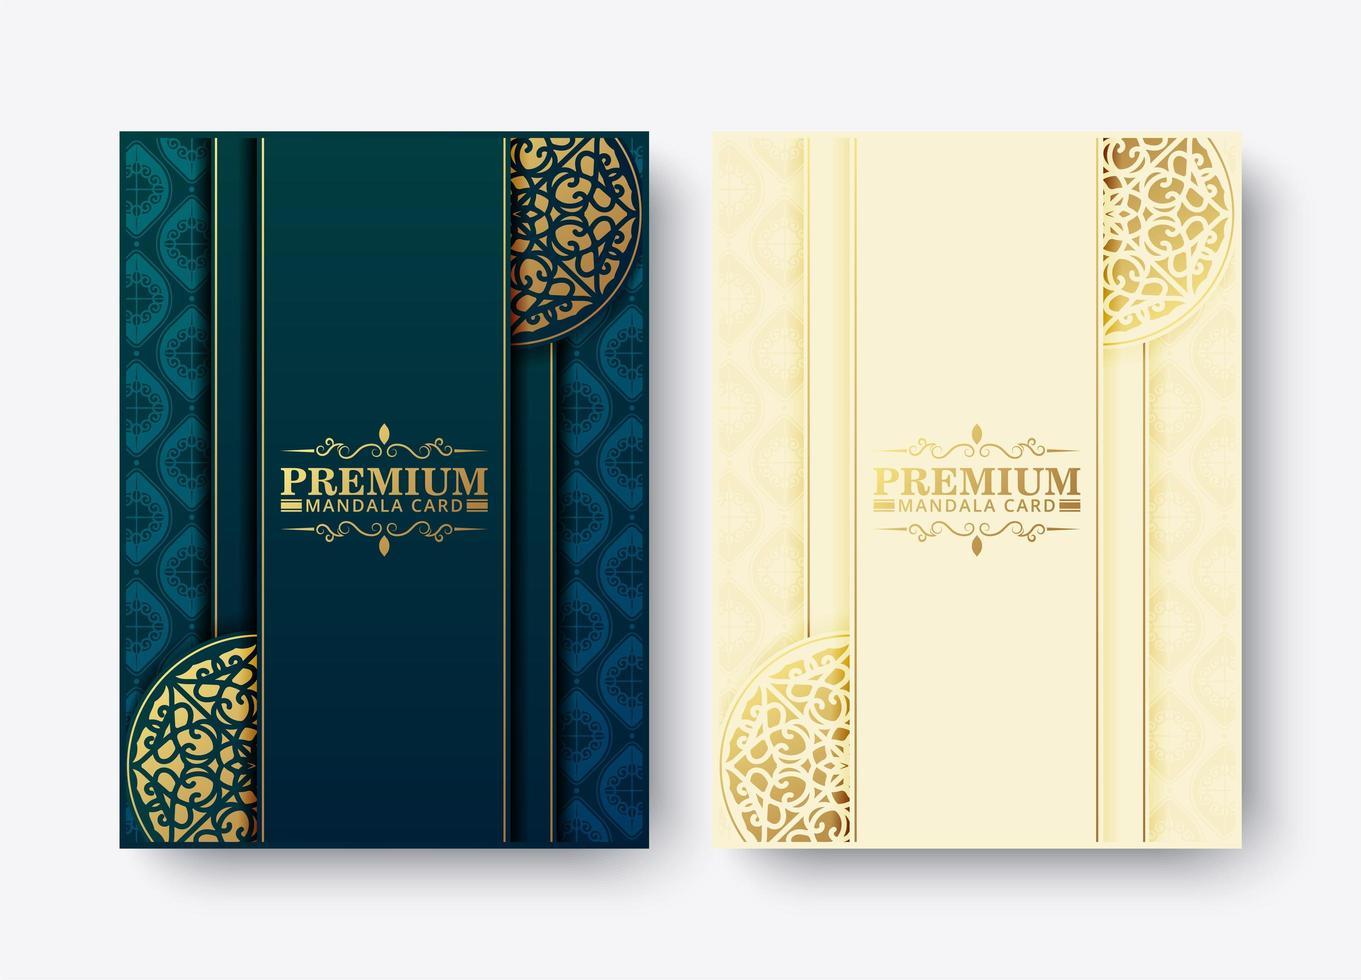 lyx premium mandala meny design set vektor